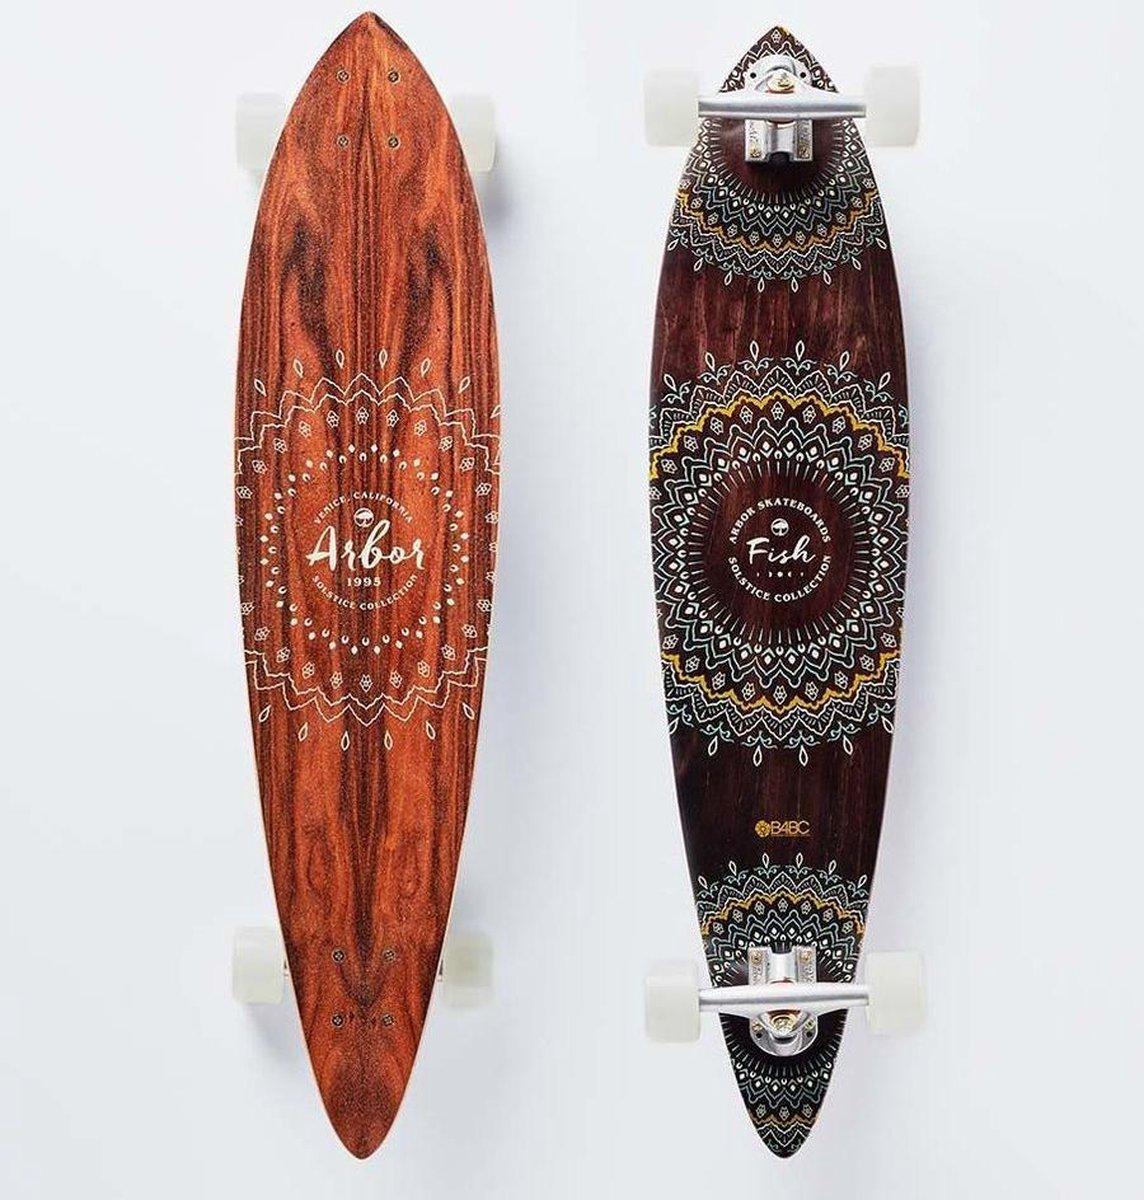 "Arbor Solstice Fish B4BC 37"" longboard"